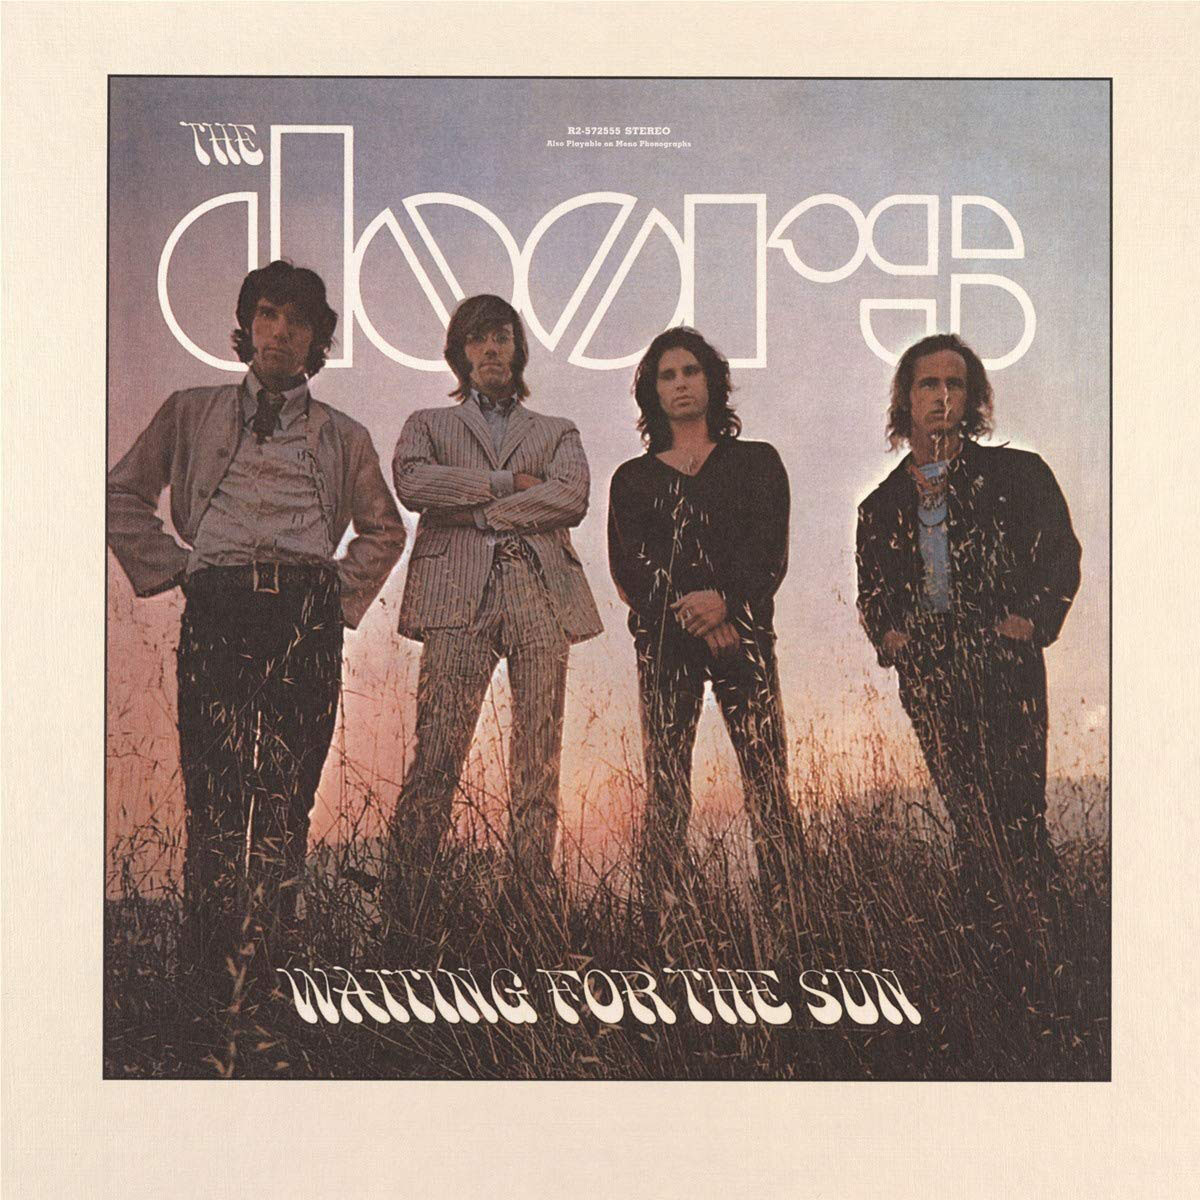 цена на The Doors The Doors. Waiting For The Sun. 50th Anniversary Edition (LP)